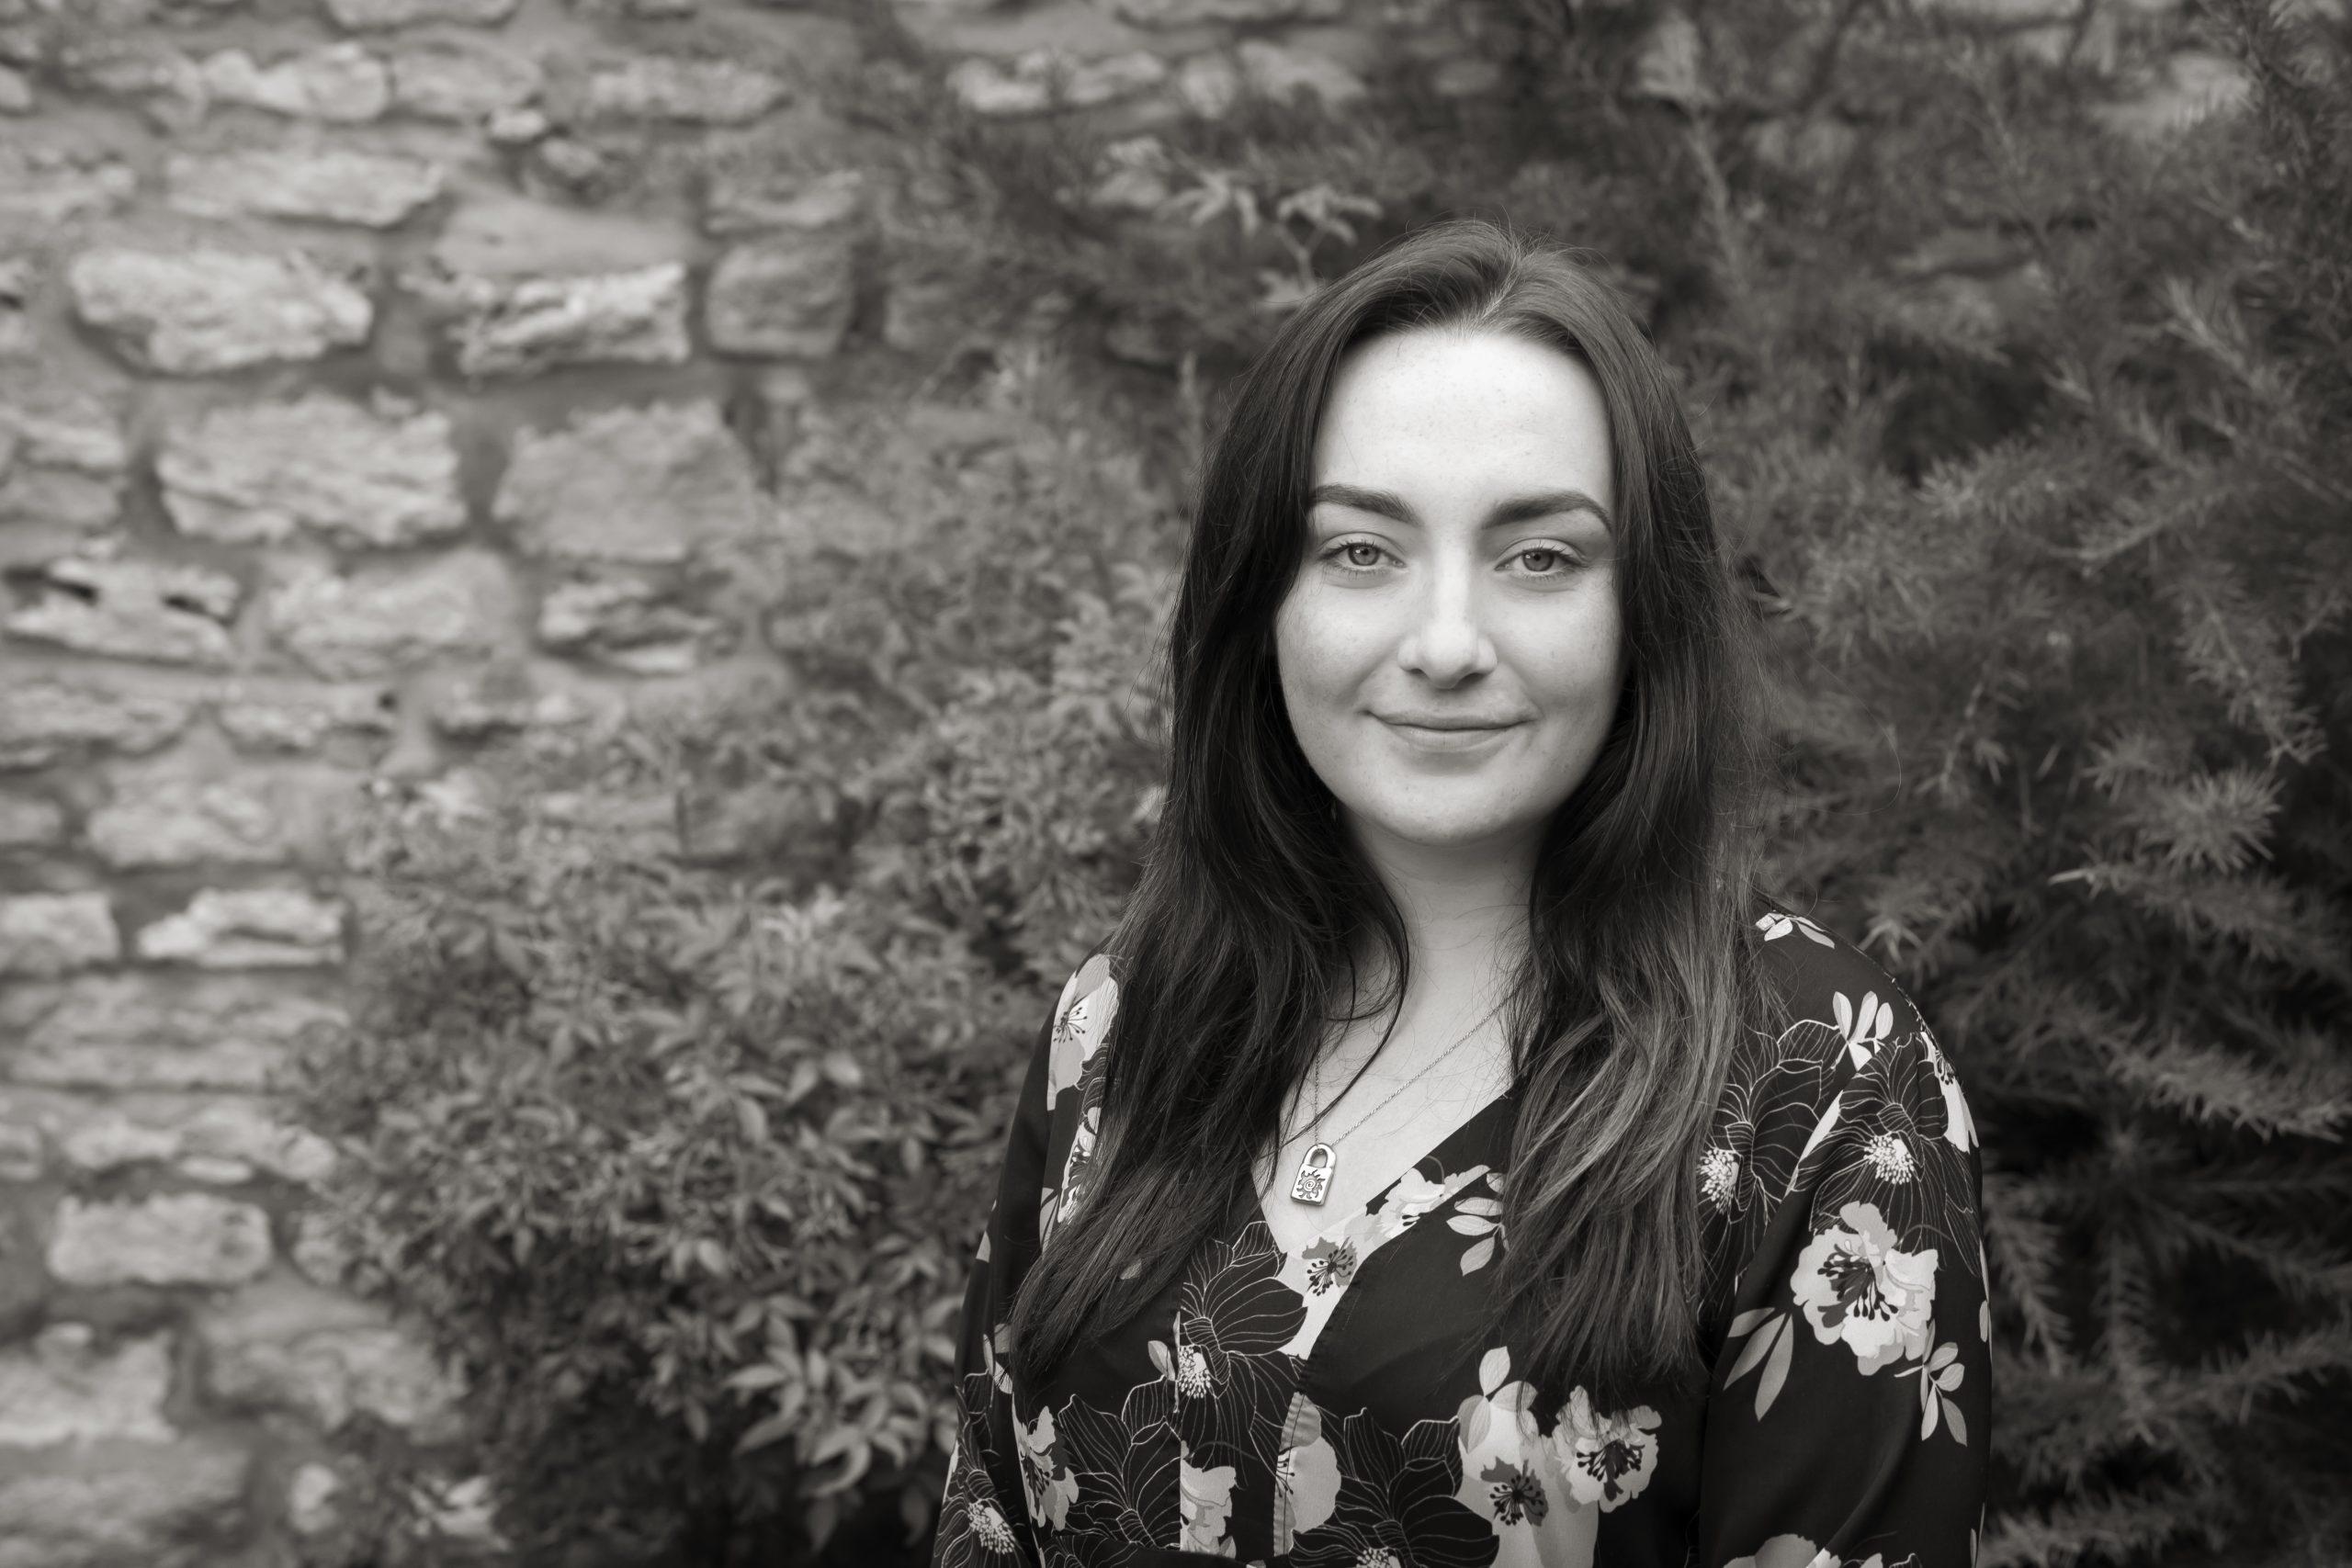 Maggie Armstrong-Gaisford